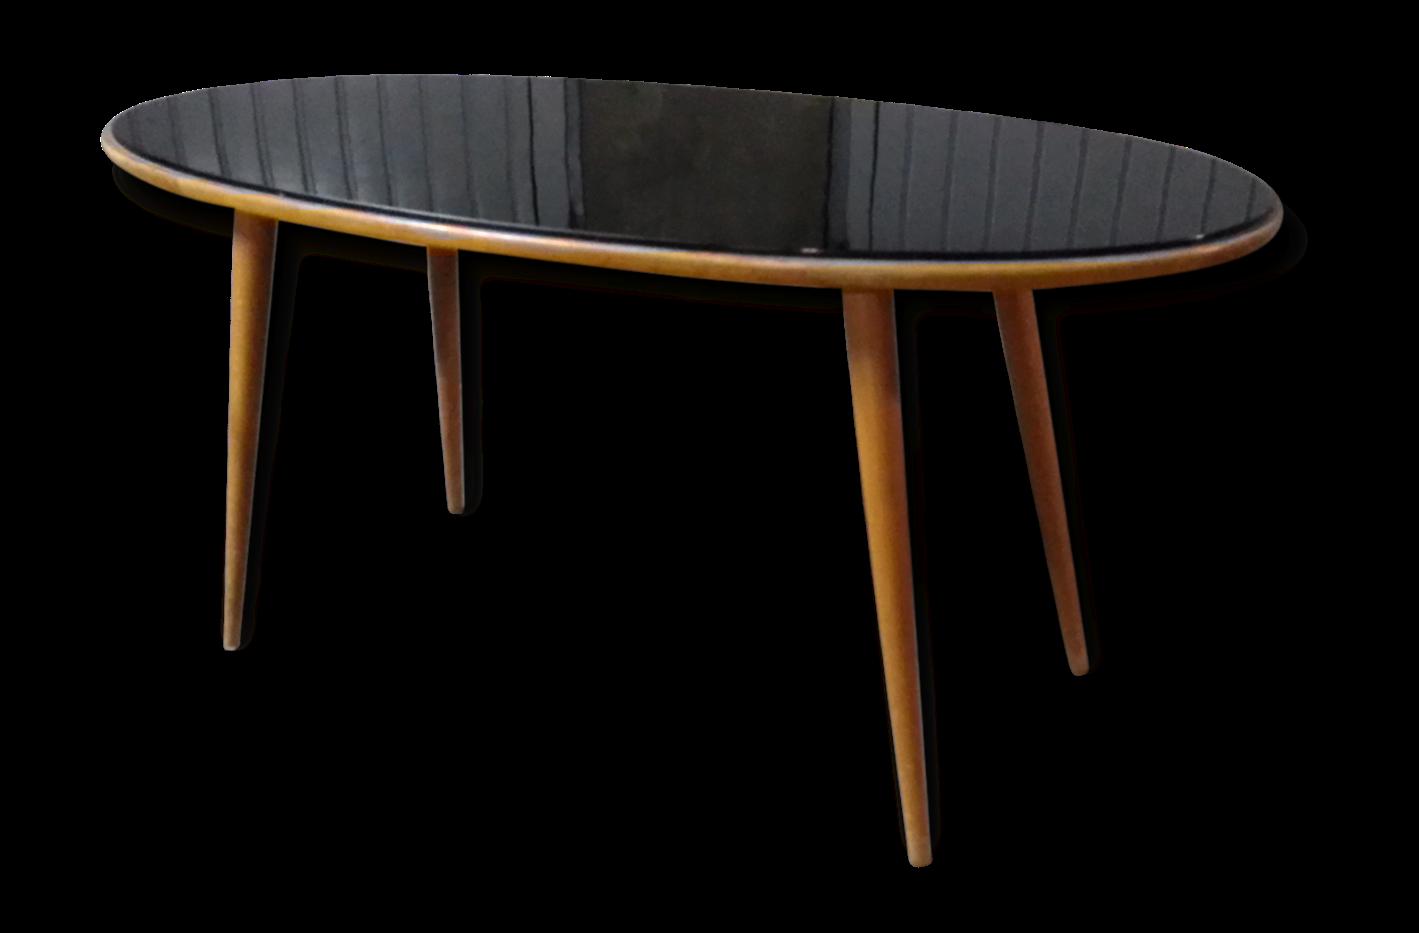 table basse nordique affordable table basse scandinave anis with table basse nordique fabulous. Black Bedroom Furniture Sets. Home Design Ideas